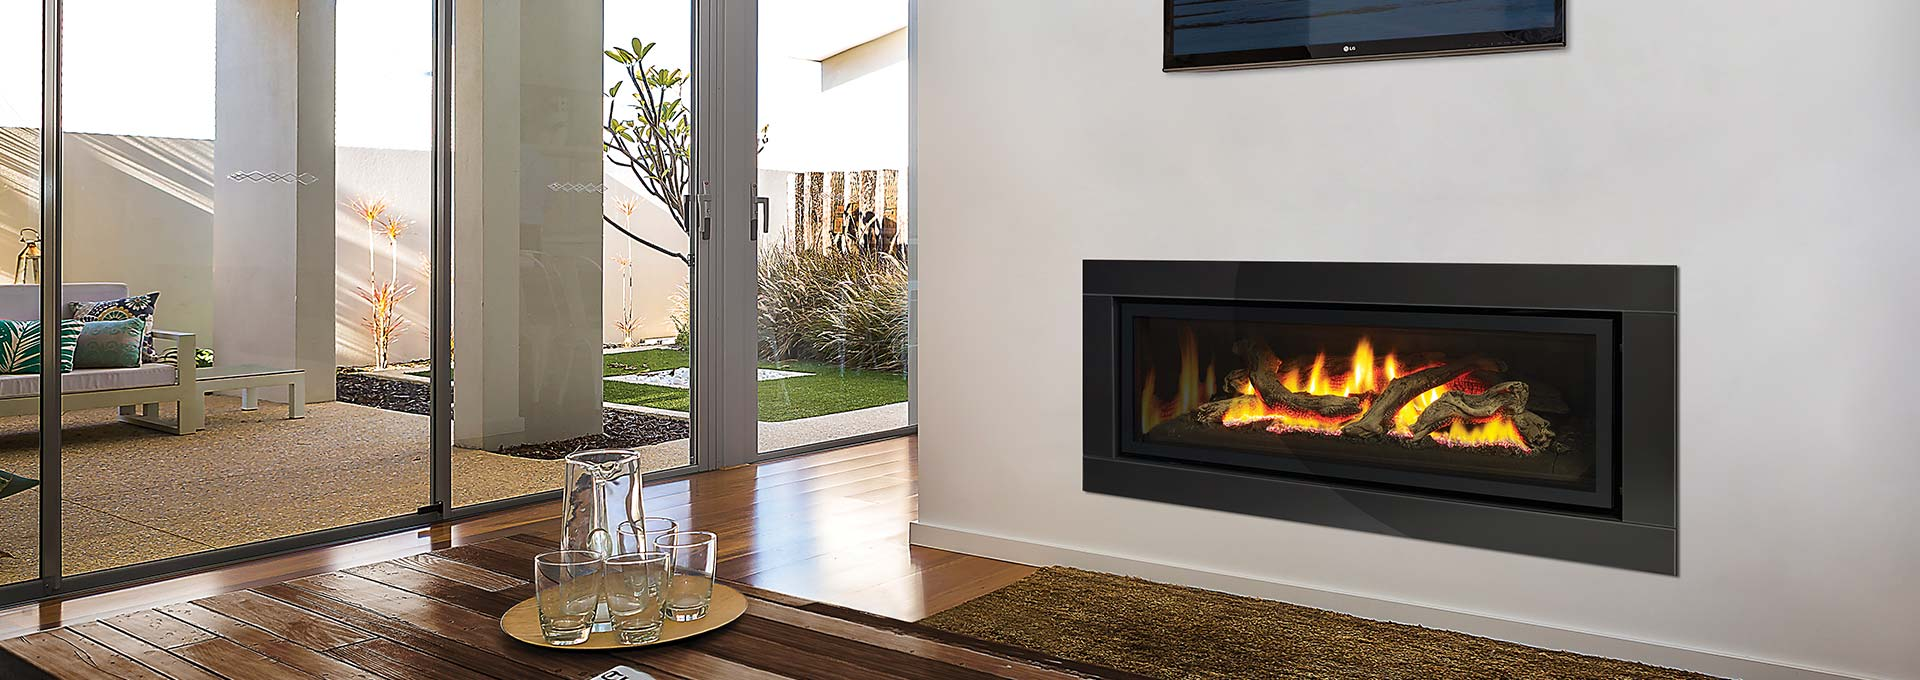 Regency Ultimate U1500E Gas Fireplace  Toronto Best Price